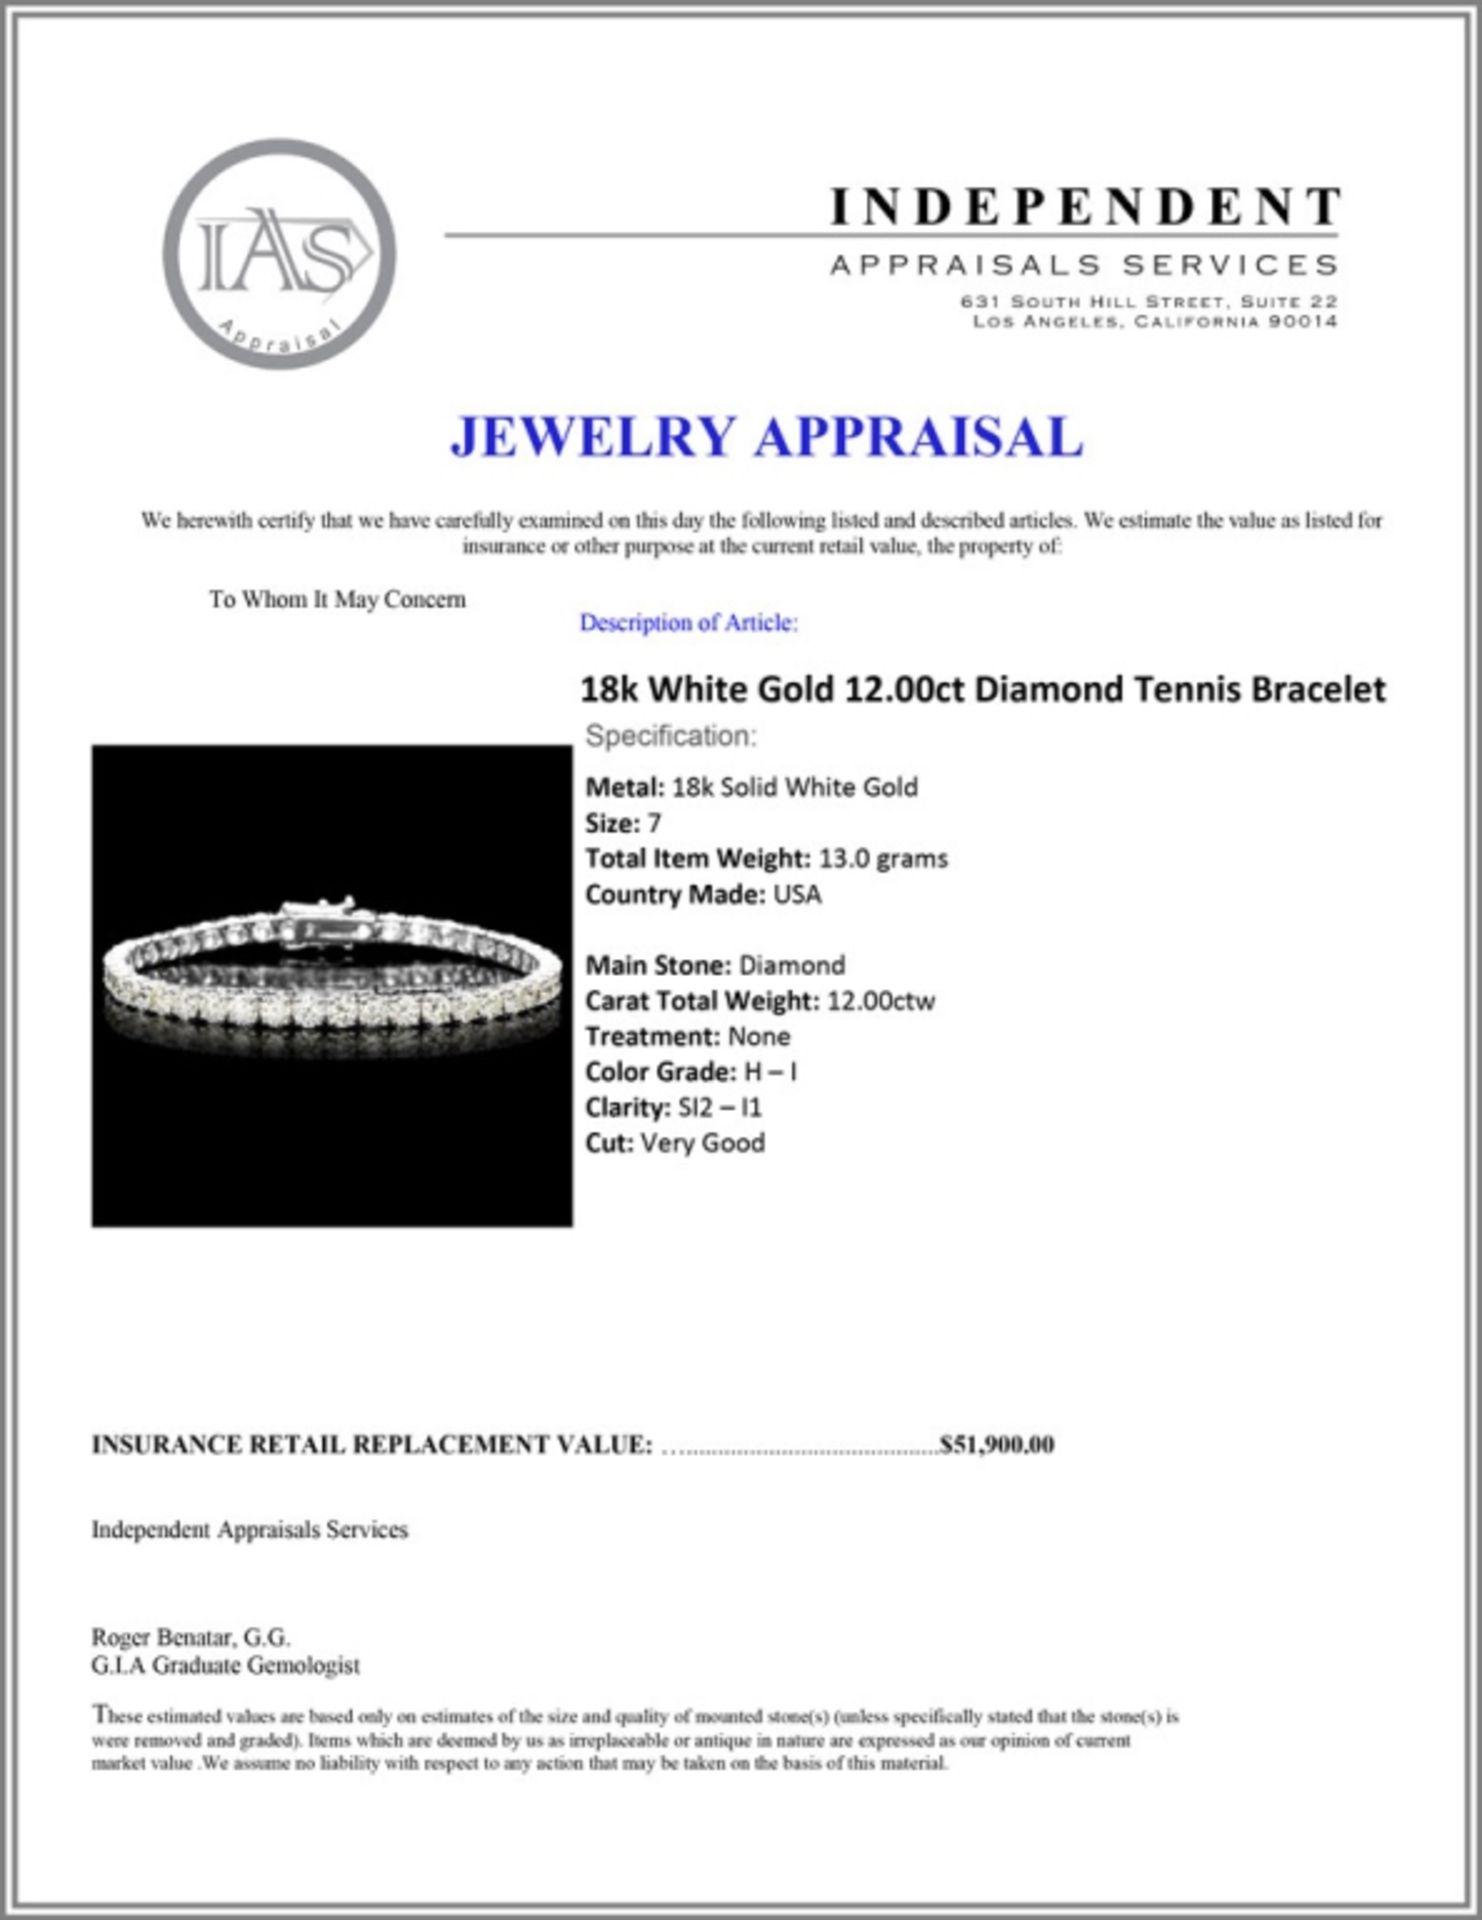 18k White Gold 12.00ct Diamond Tennis Bracelet - Image 4 of 4